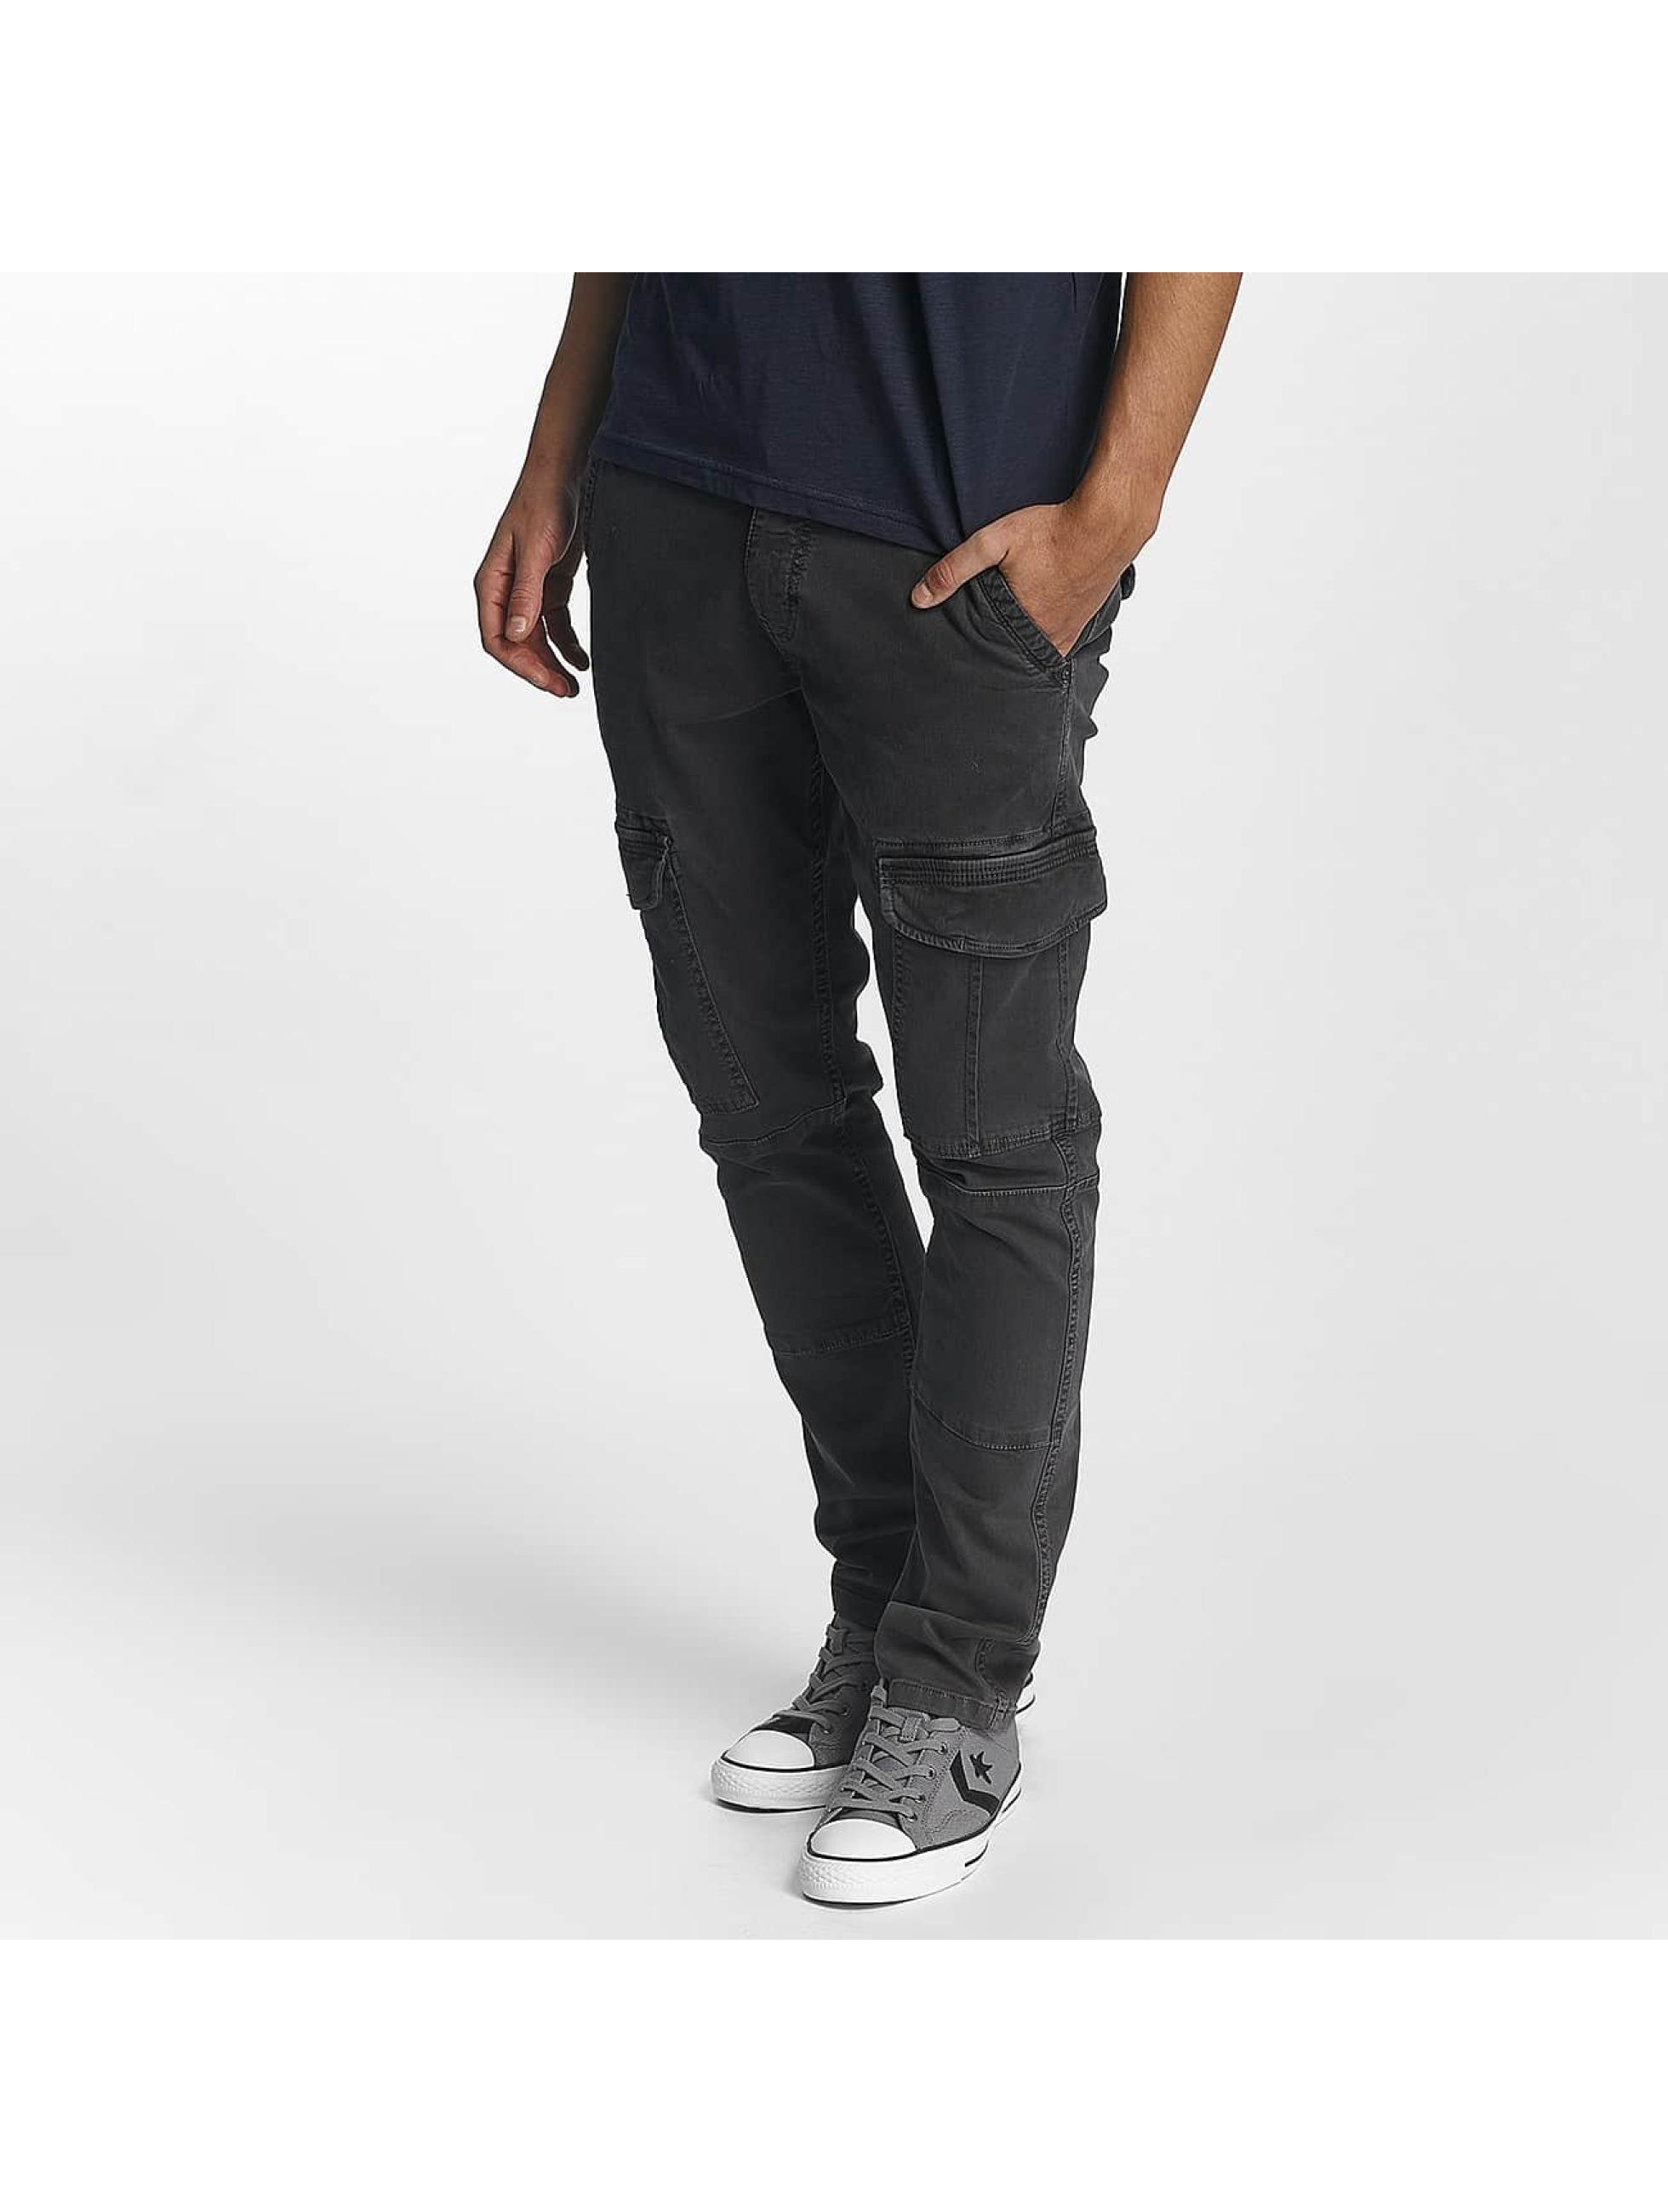 Mavi Jeans Männer Cargohose Yves Cargo in grau